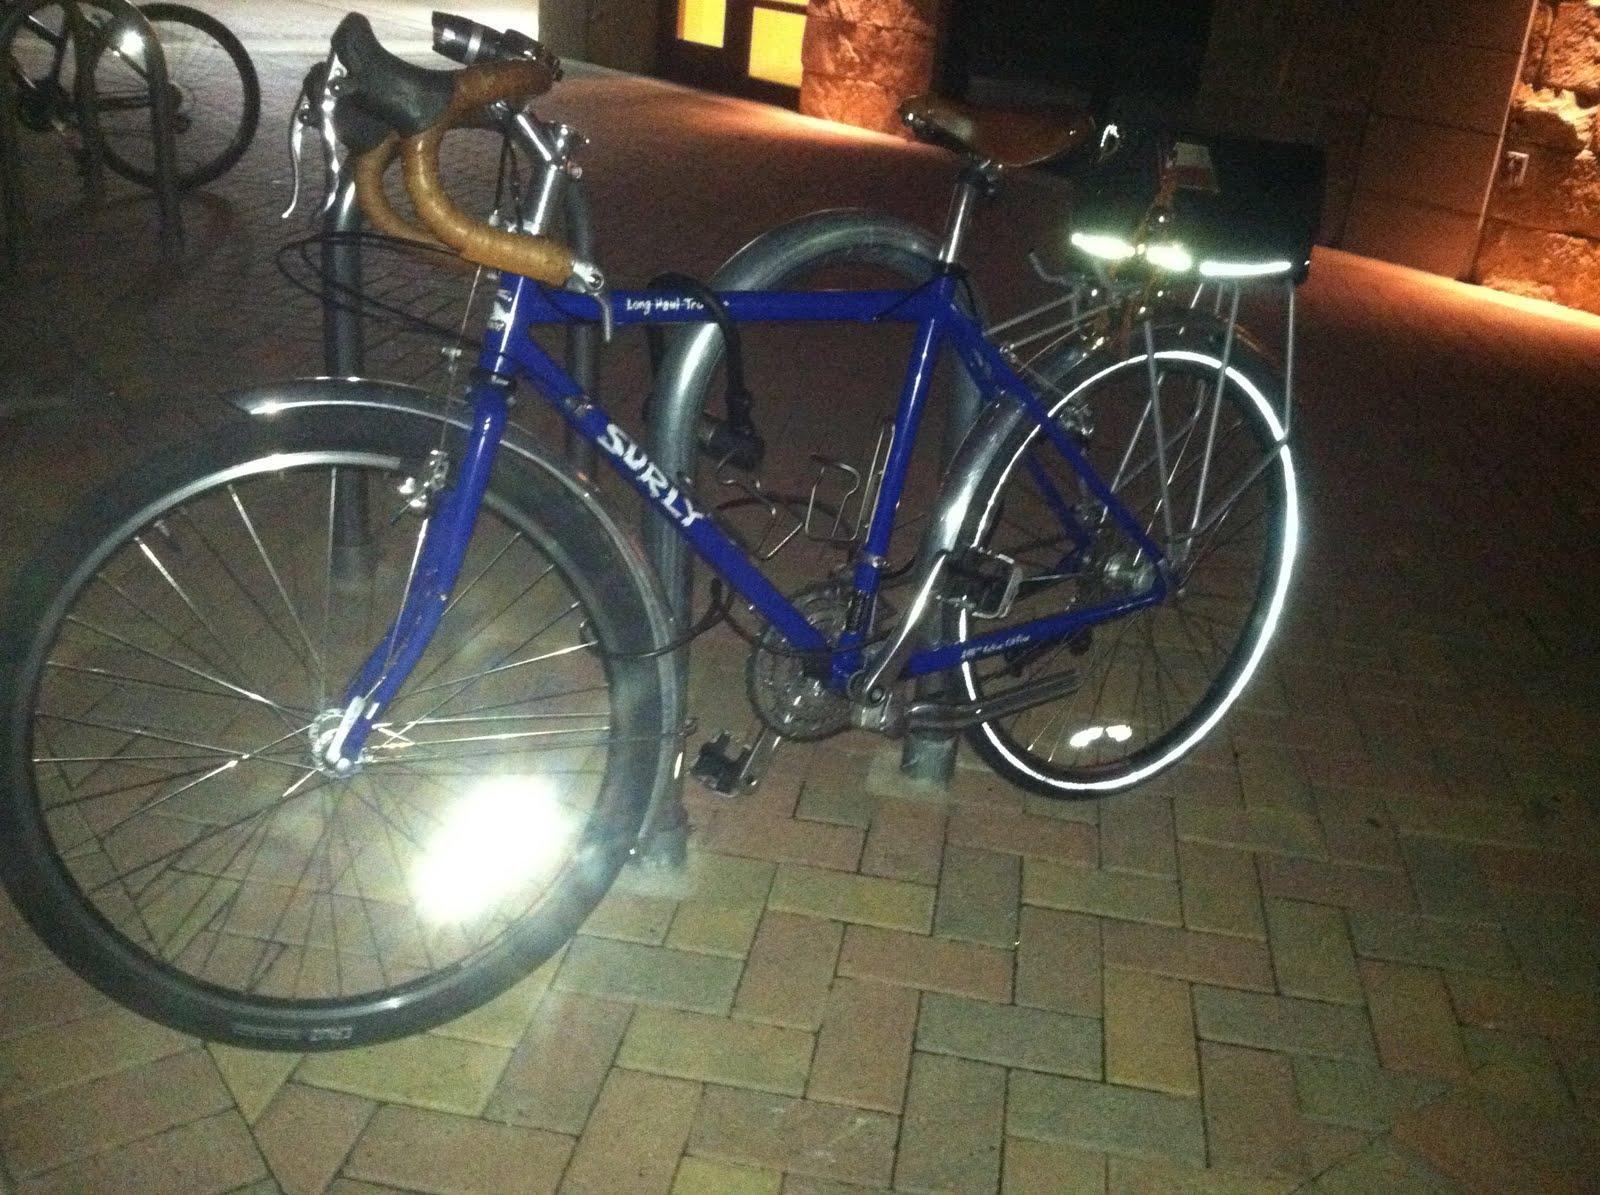 OnGuard 8031 Doberman 6/' x 12mm Combination Bike Cable Lock Reset fit Kryptonite